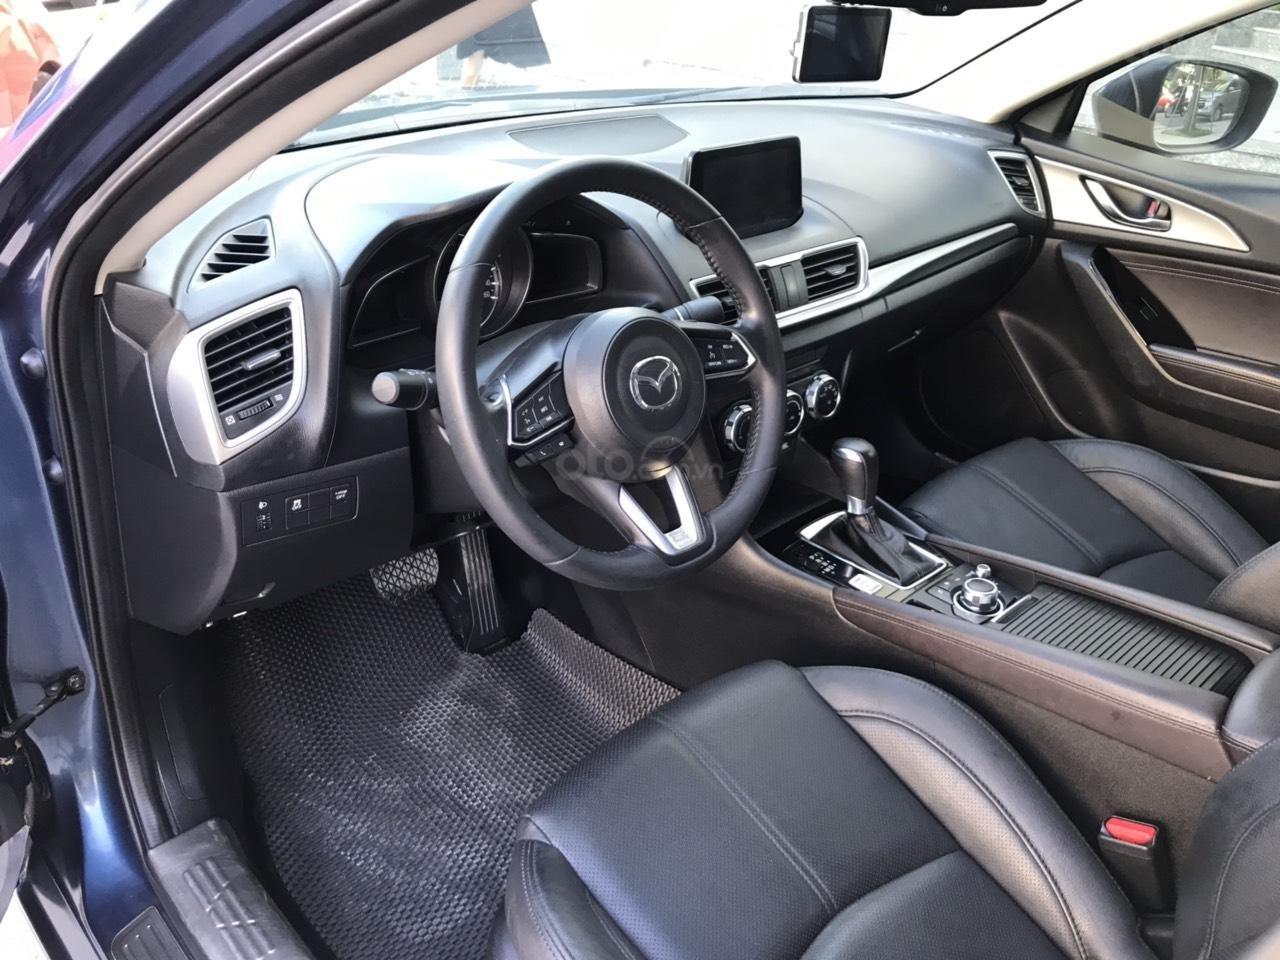 ManyCar bán Mazda 3 sedan model 2018, xe đẹp đi ít (4)